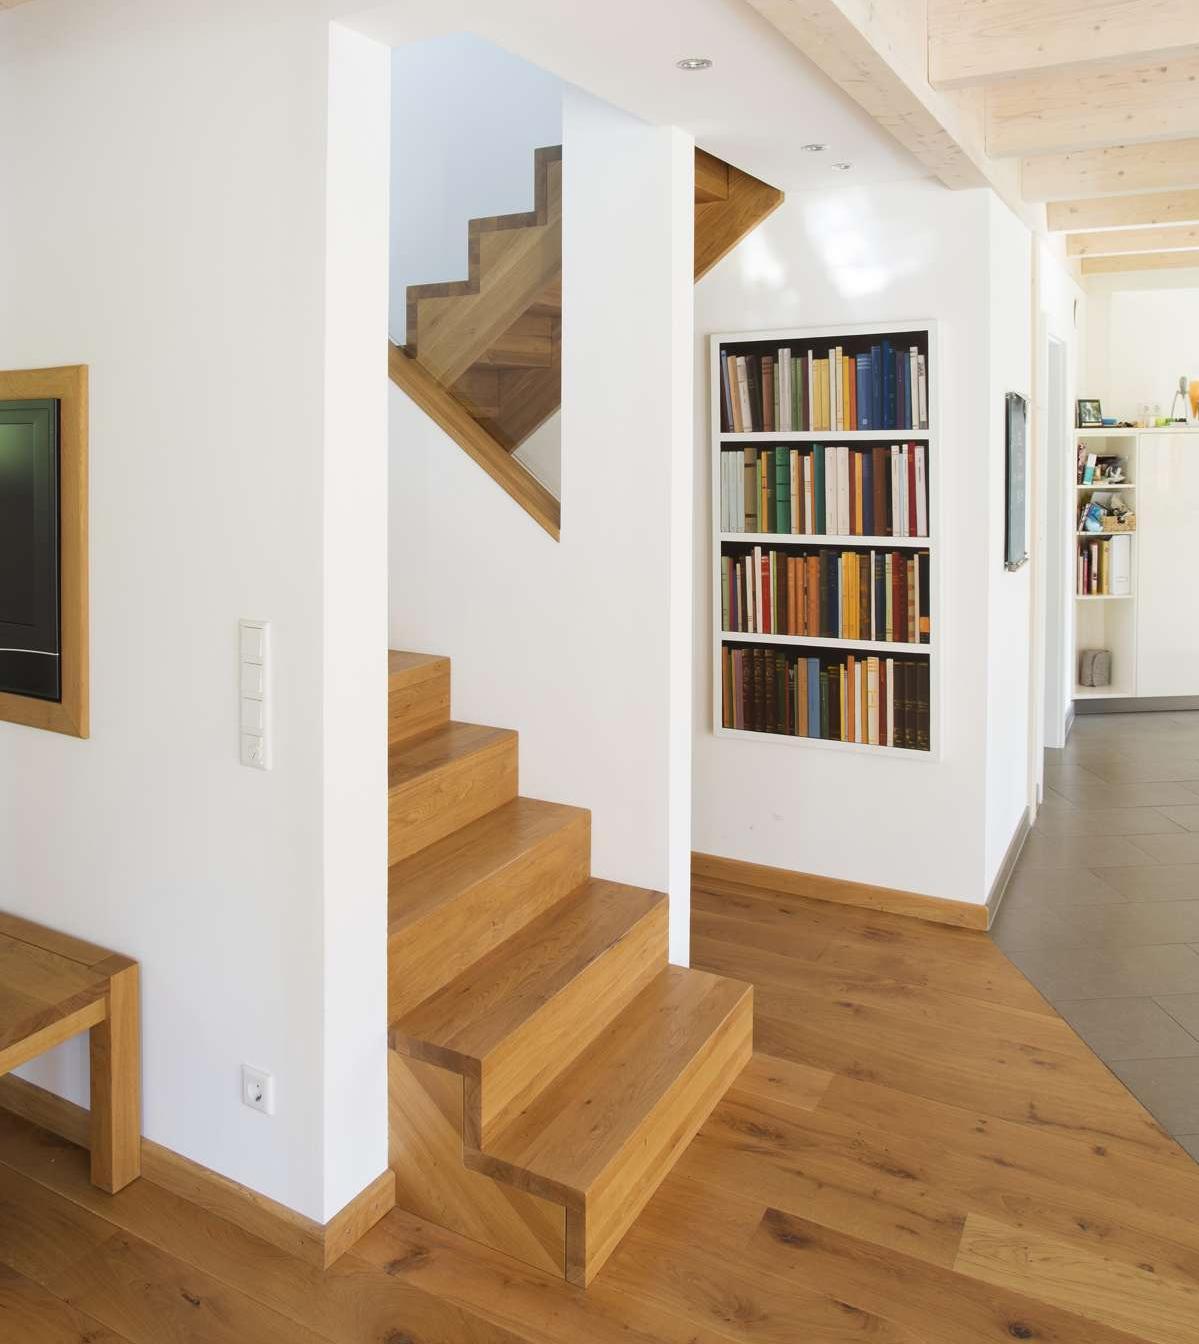 arcus treppen wangentreppen treppen mit holzwangen oder stahlwangen. Black Bedroom Furniture Sets. Home Design Ideas